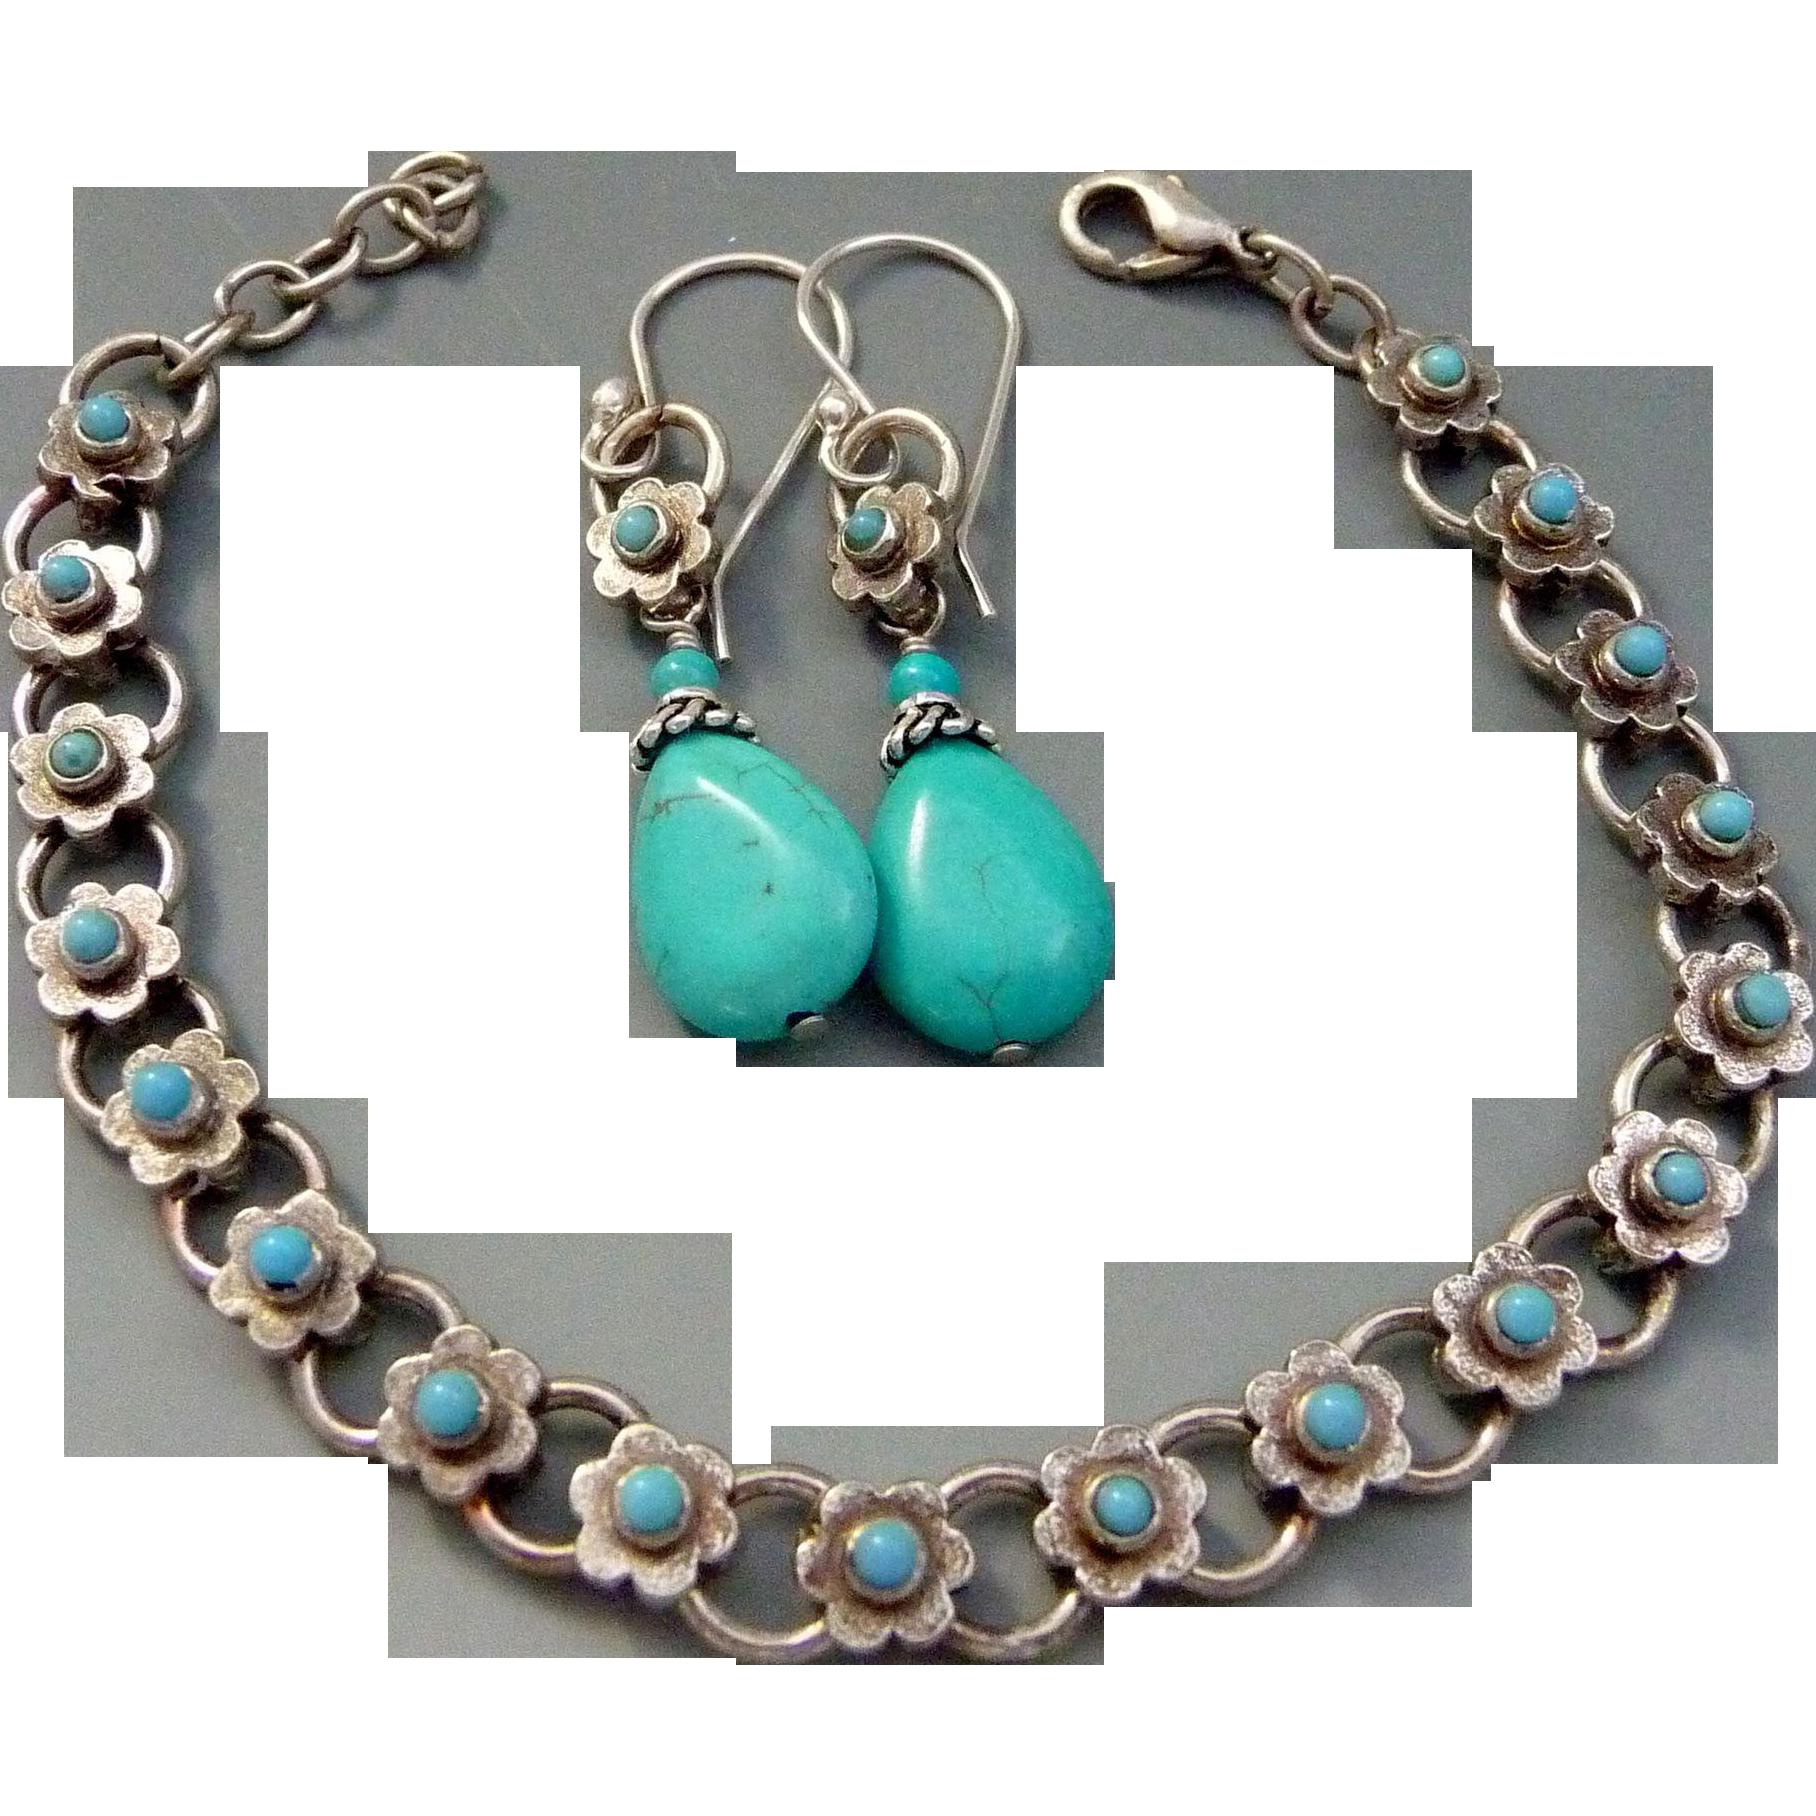 Vintage Upcycled Turquoise Bracelet And Earring Set